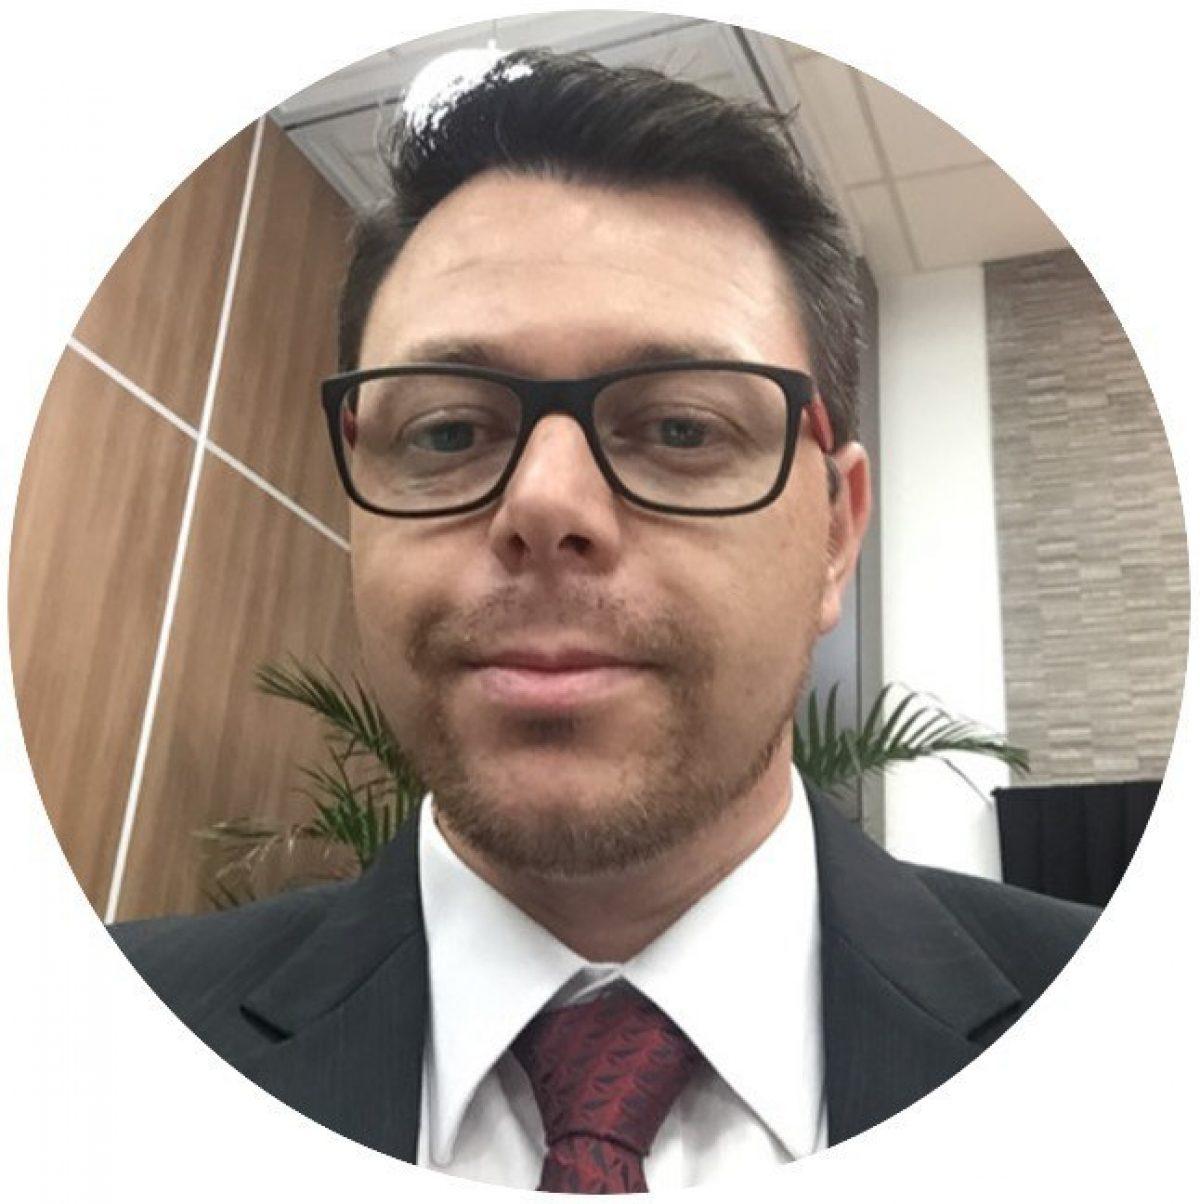 Rodrigo Santos Microban Antimicrobial Solutions 2 mtime20190605051107